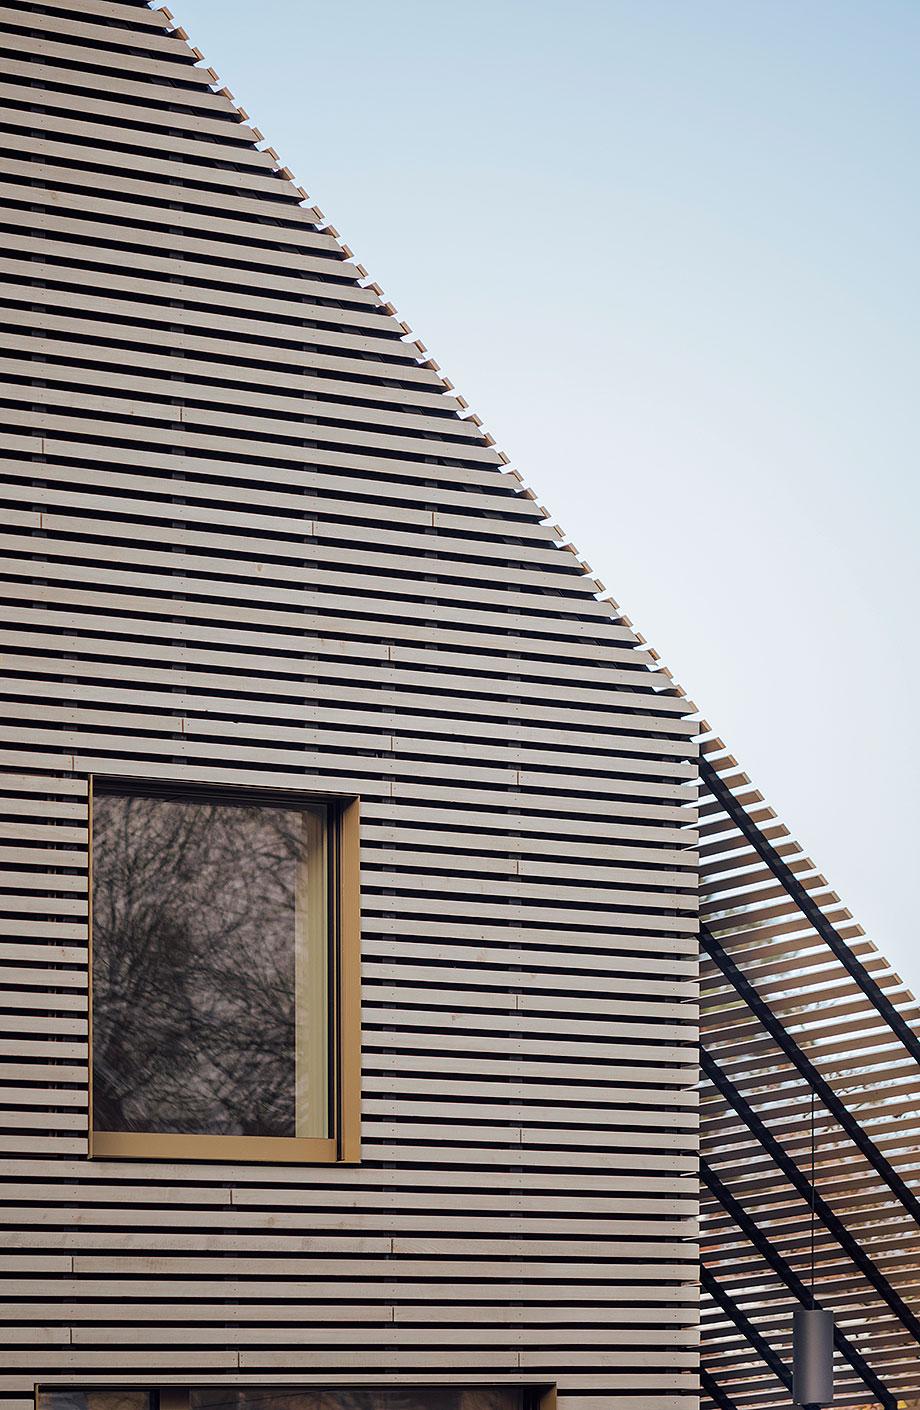 la casa de la pergola de rundzwei architekten (16) - foto gui rebelo